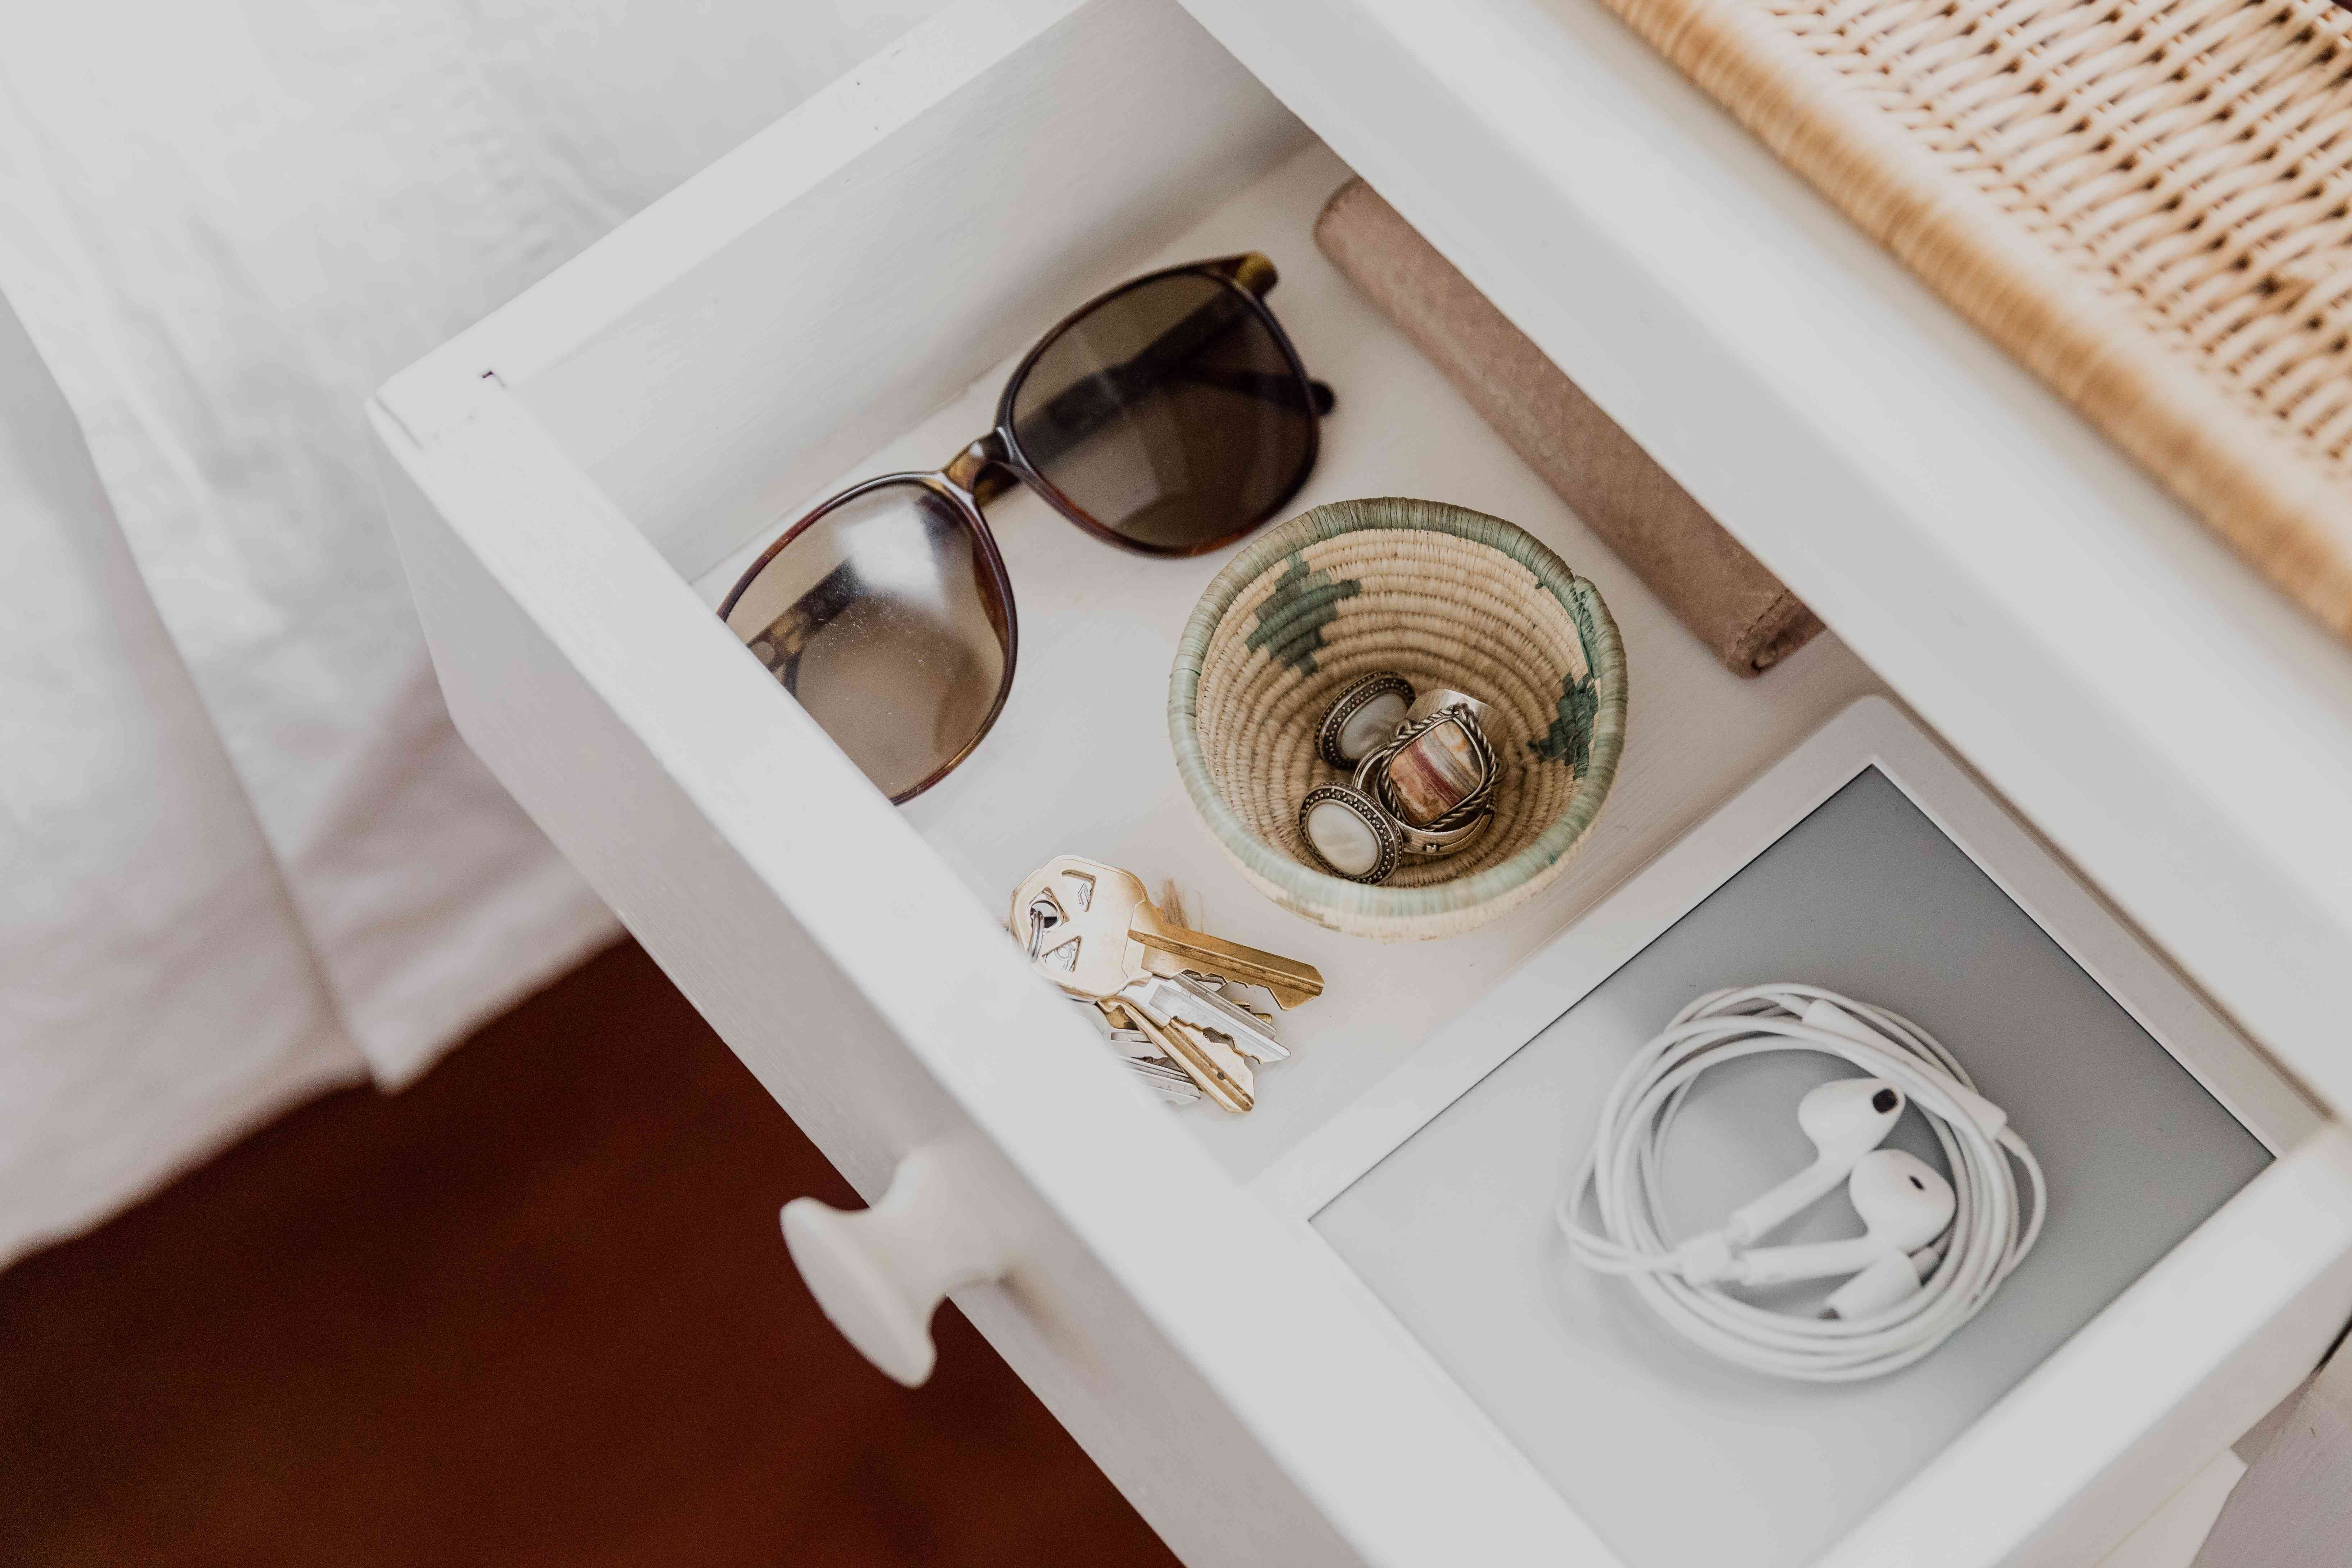 Sunglasses, keys, earphones and jewelry organized inside nightstand drawer